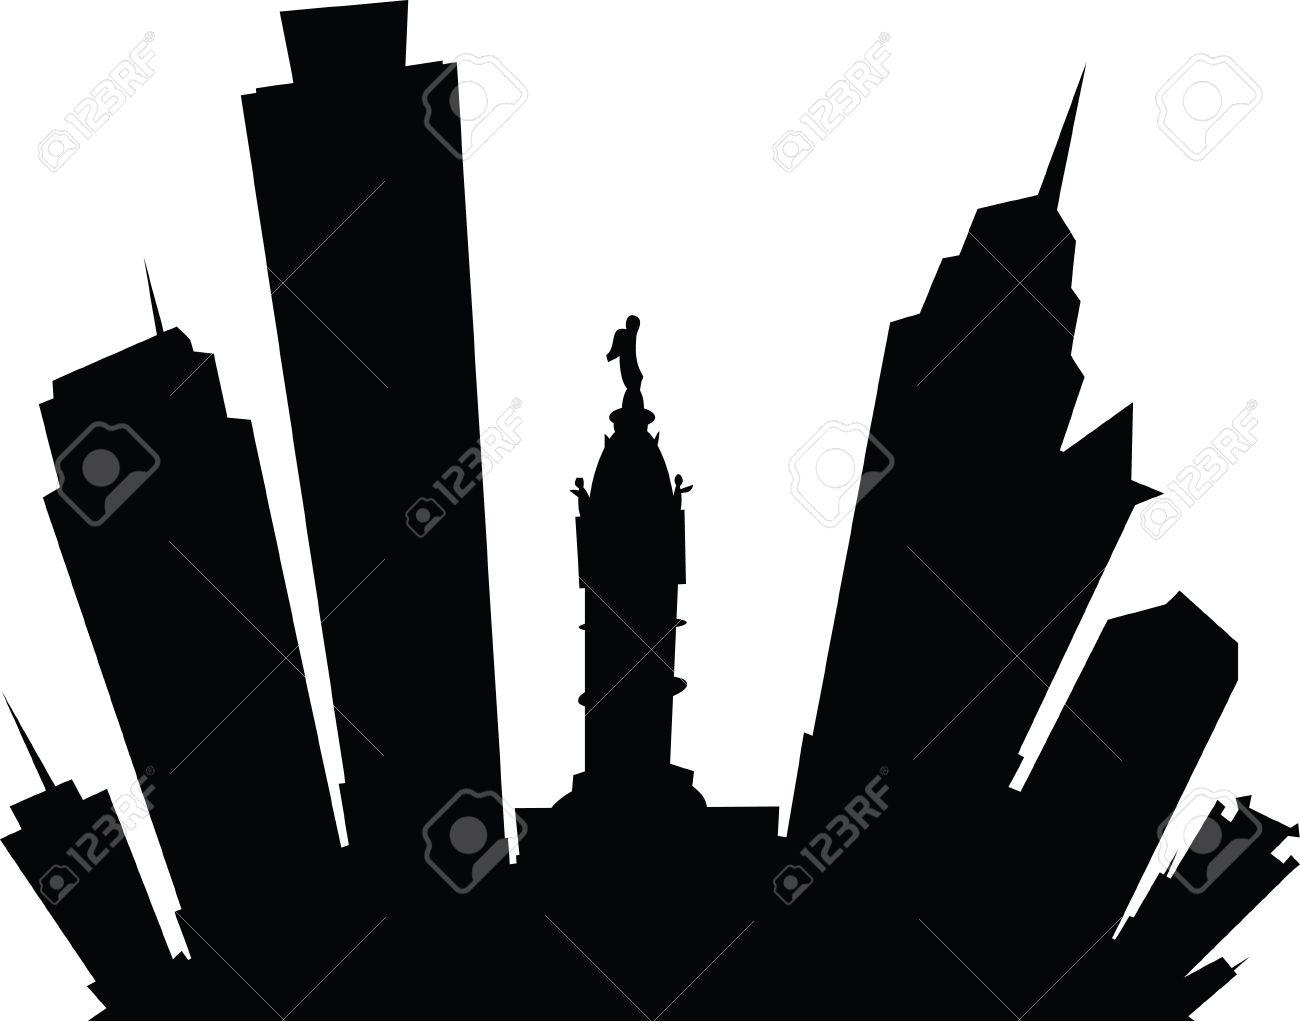 cartoon skyline silhouette of the city of philadelphia pennsylvania rh 123rf com philadelphia skyline silhouette vector philadelphia skyline silhouette vector